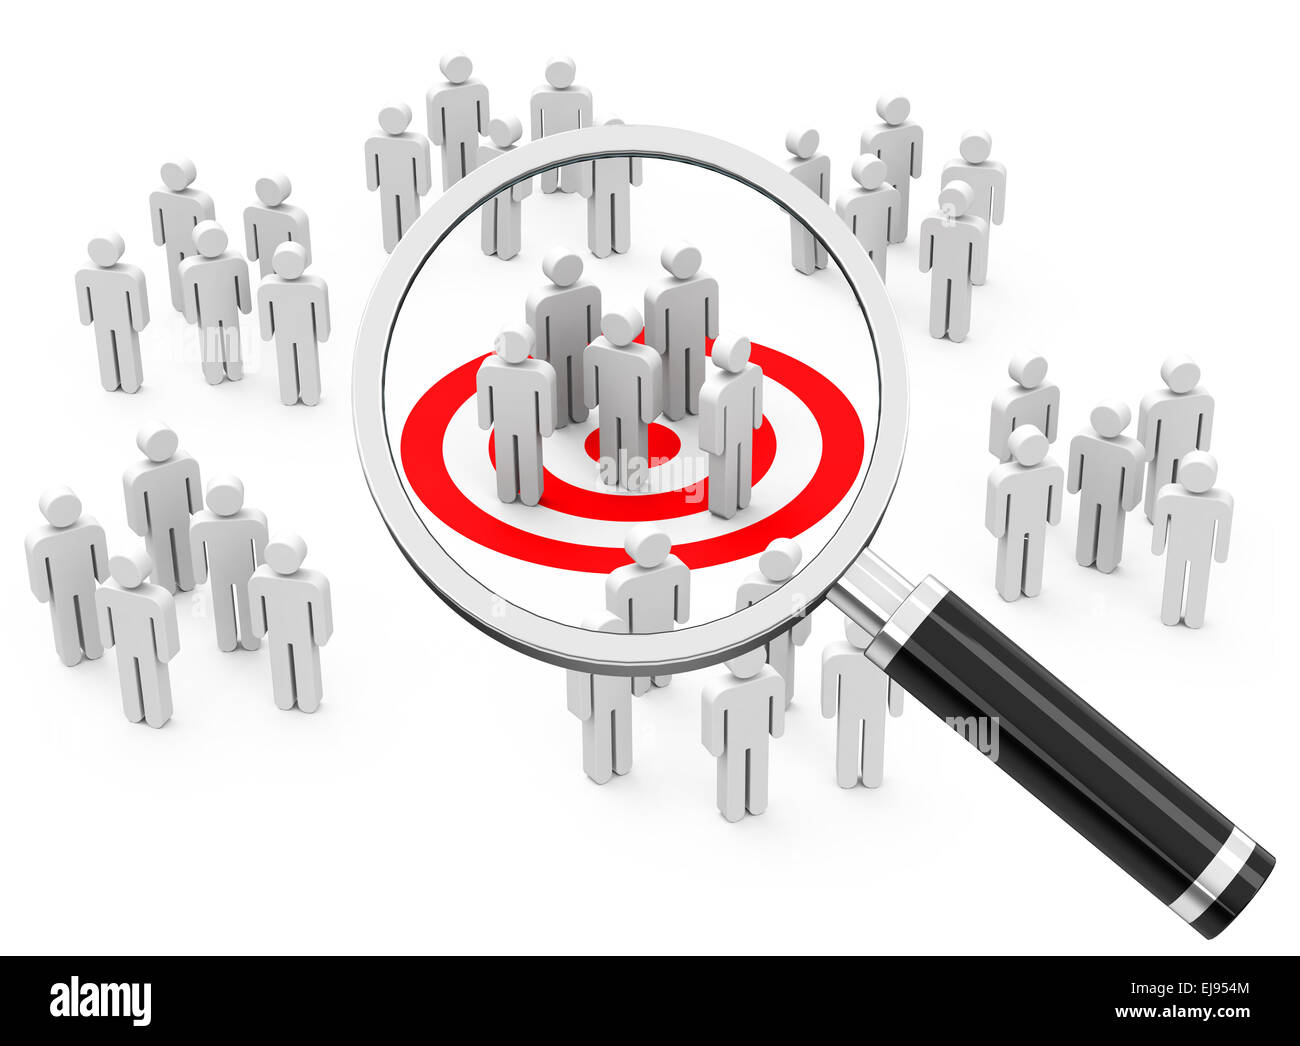 market and consumer analysis - Stock Image